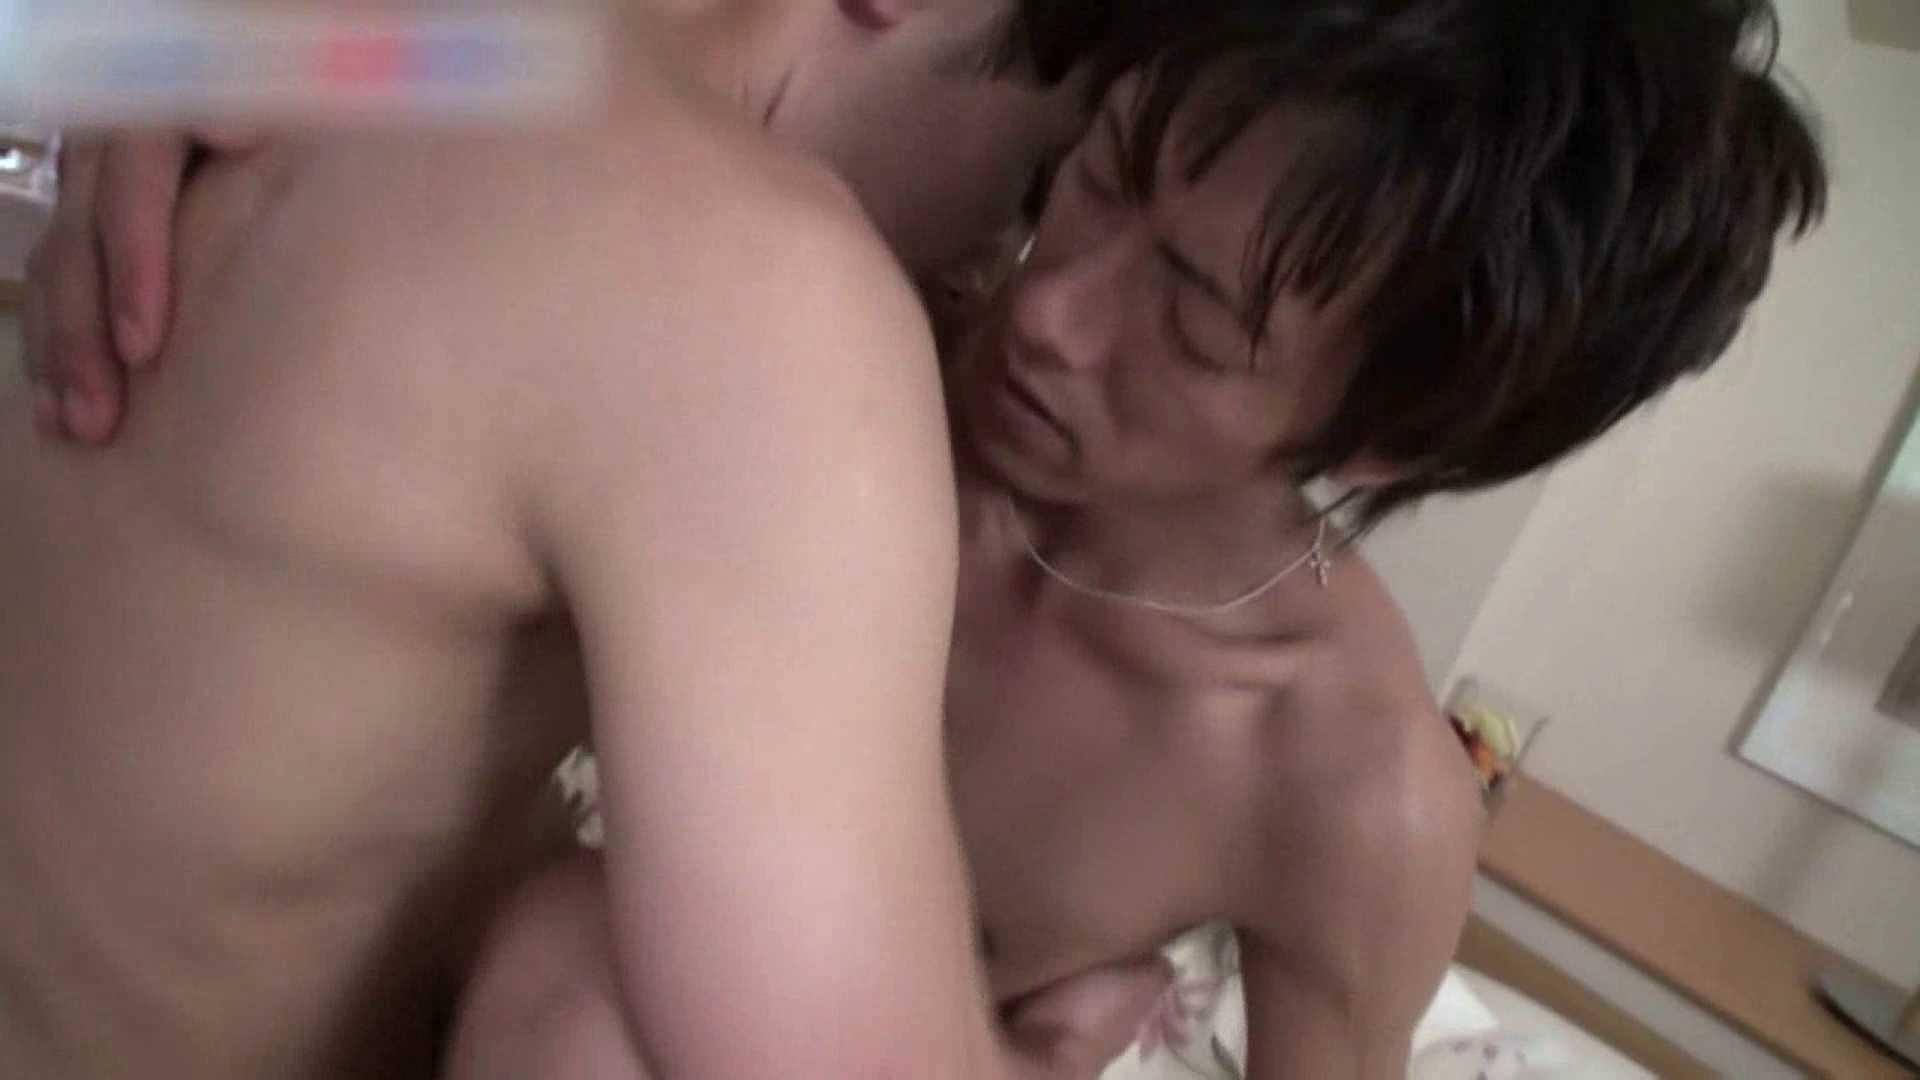 ヤリヤリ野郎共倶楽部vol.19後編 生挿入  22pic 21